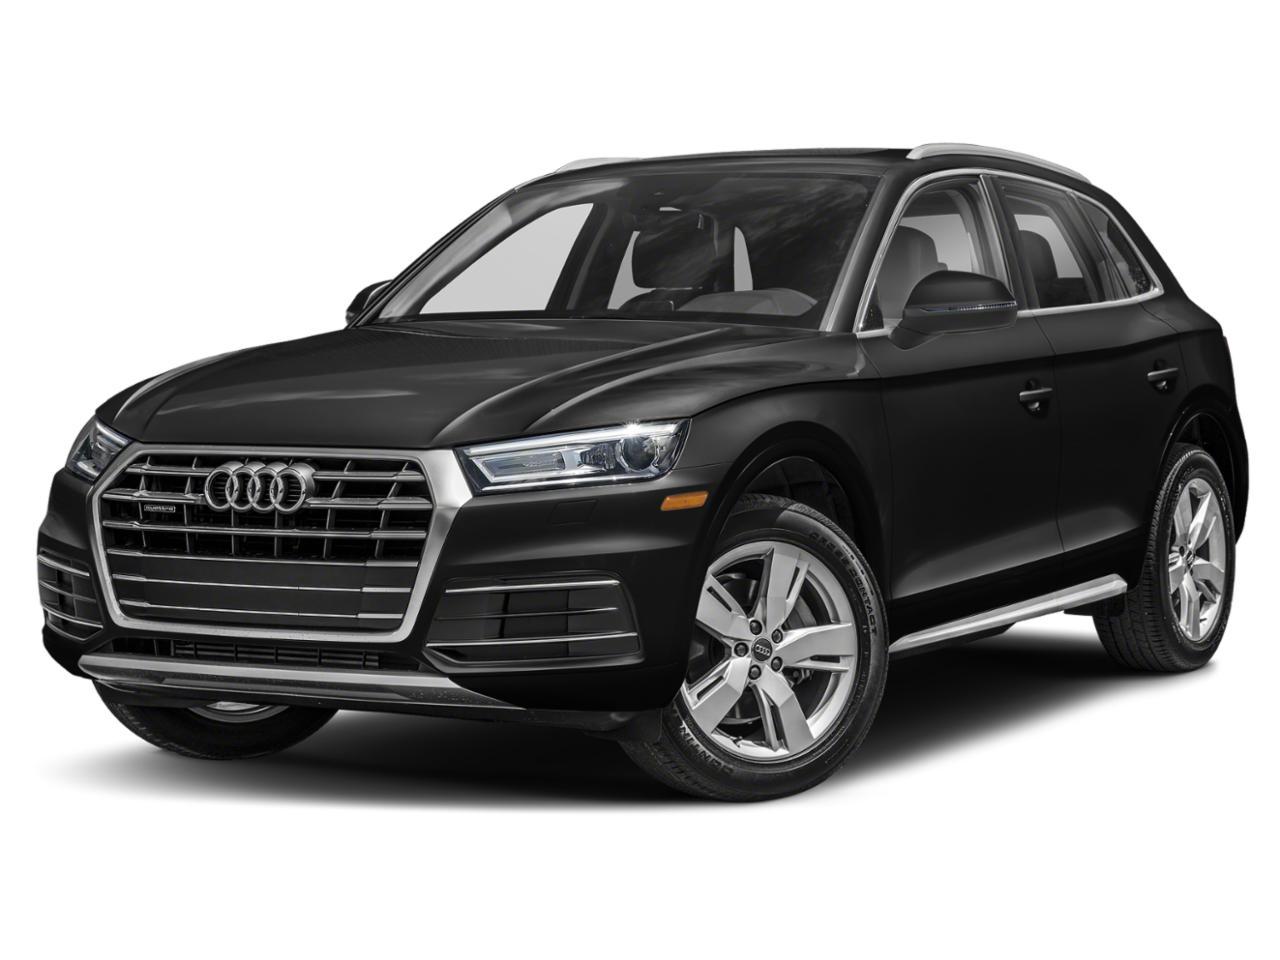 2020 Audi Q5 Vehicle Photo in Sugar Land, TX 77478